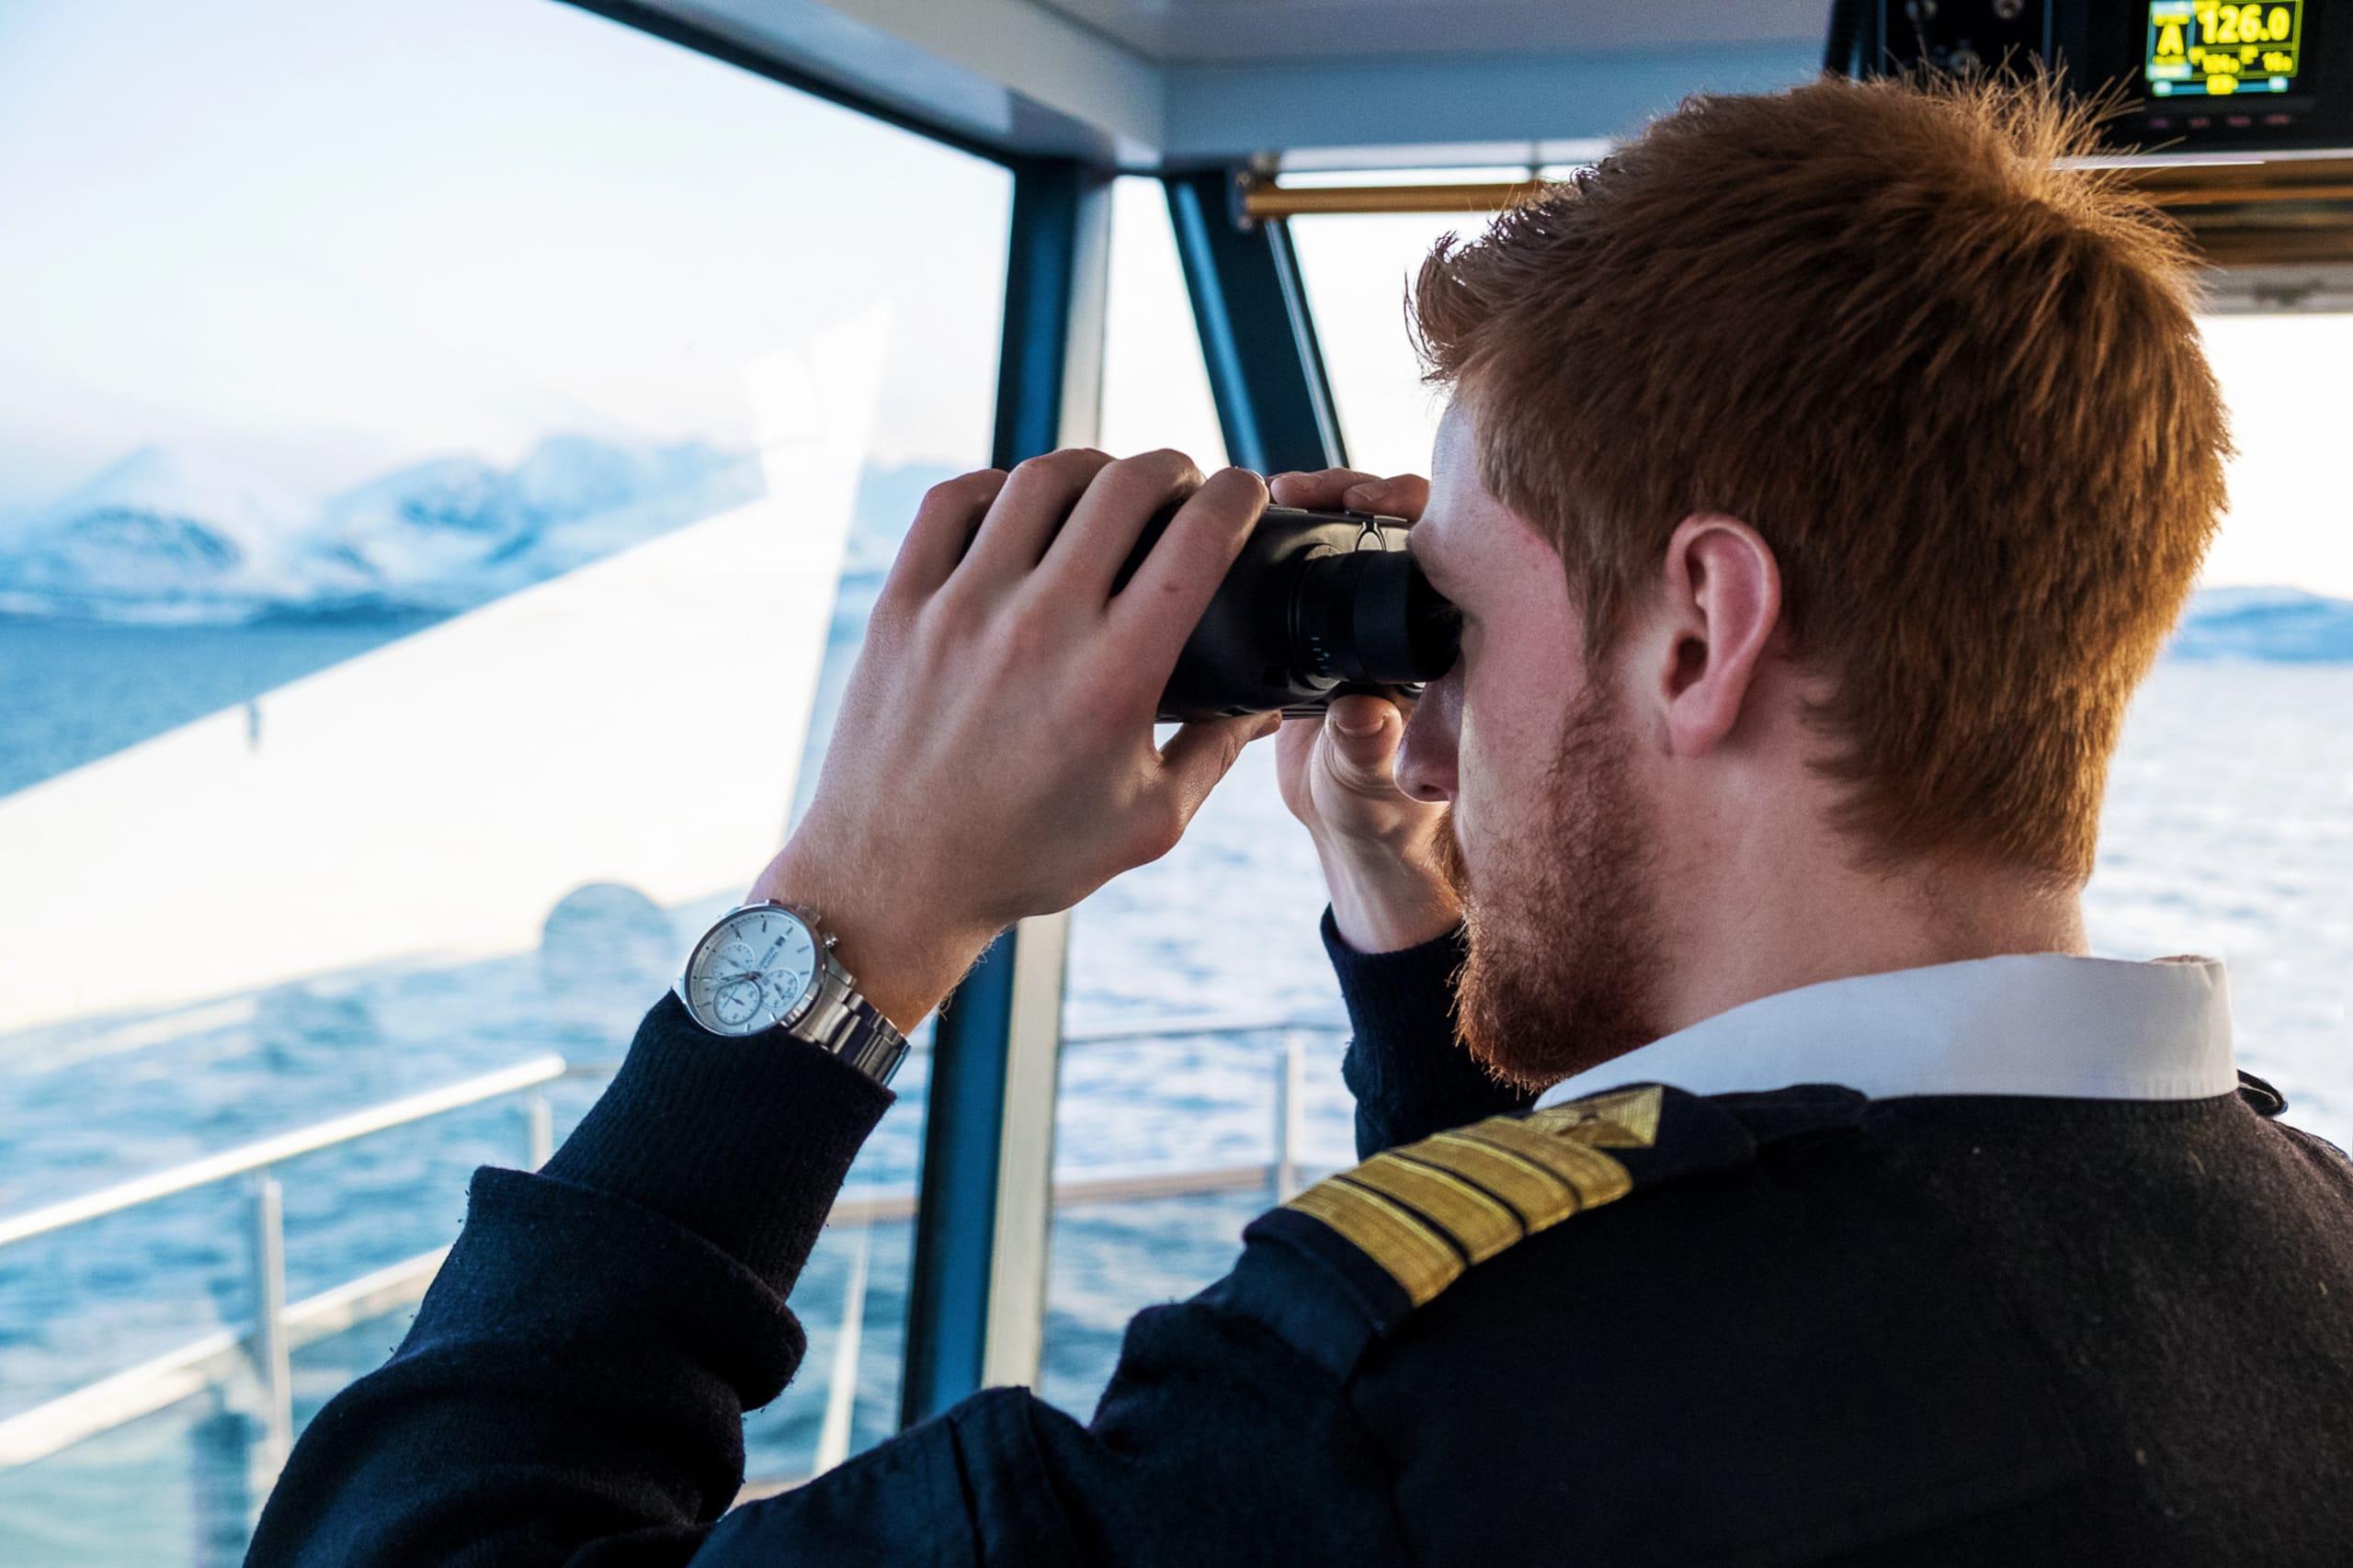 Captain on Brim Explorer